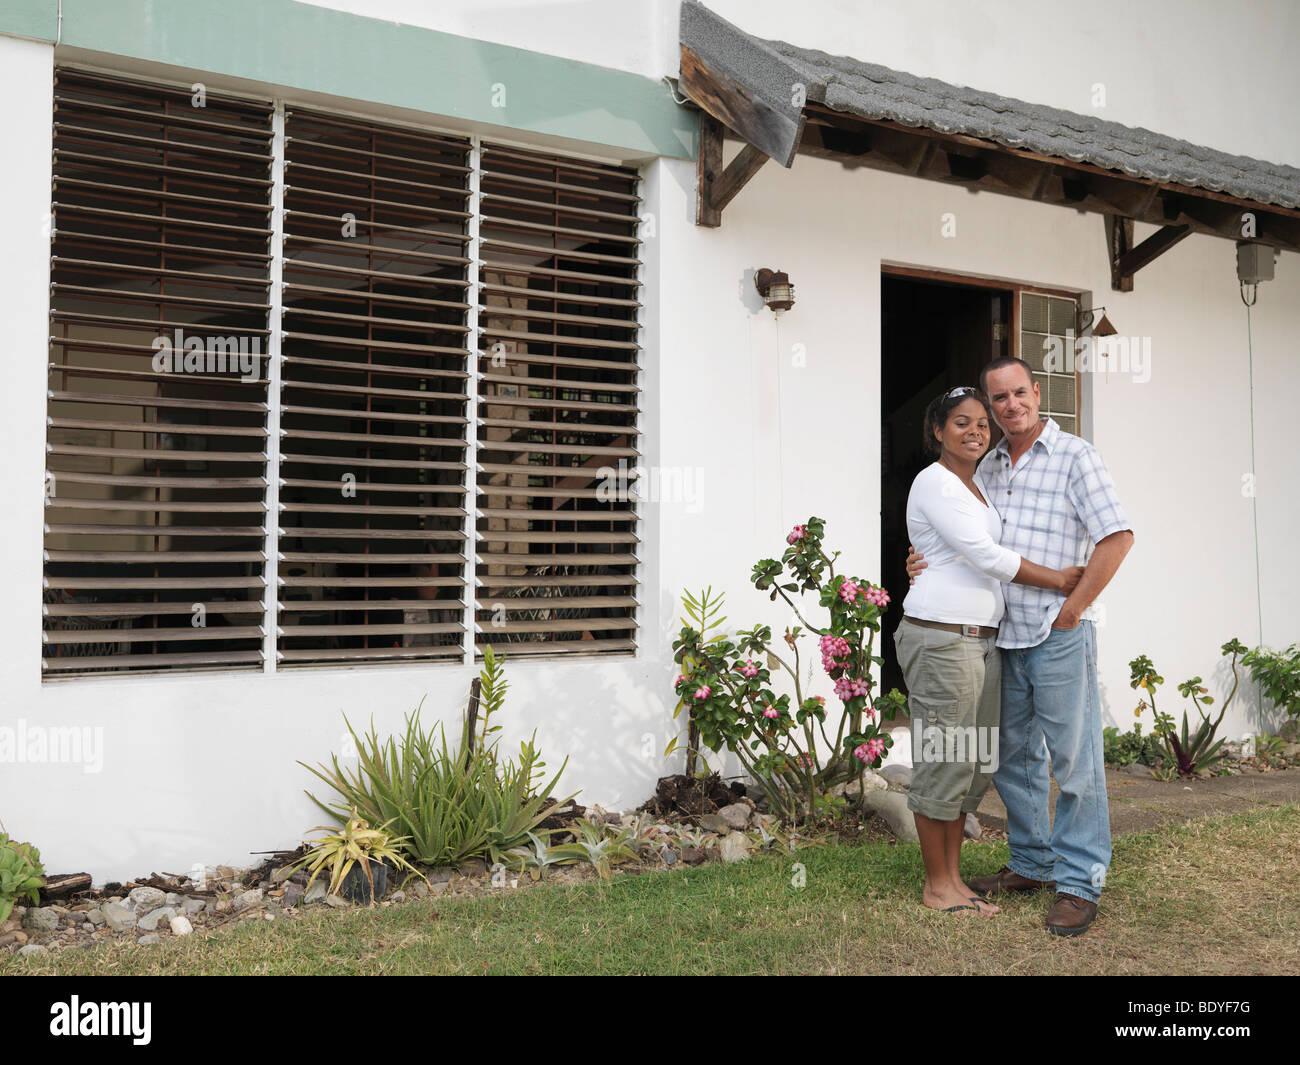 Couple Outside White House - Stock Image